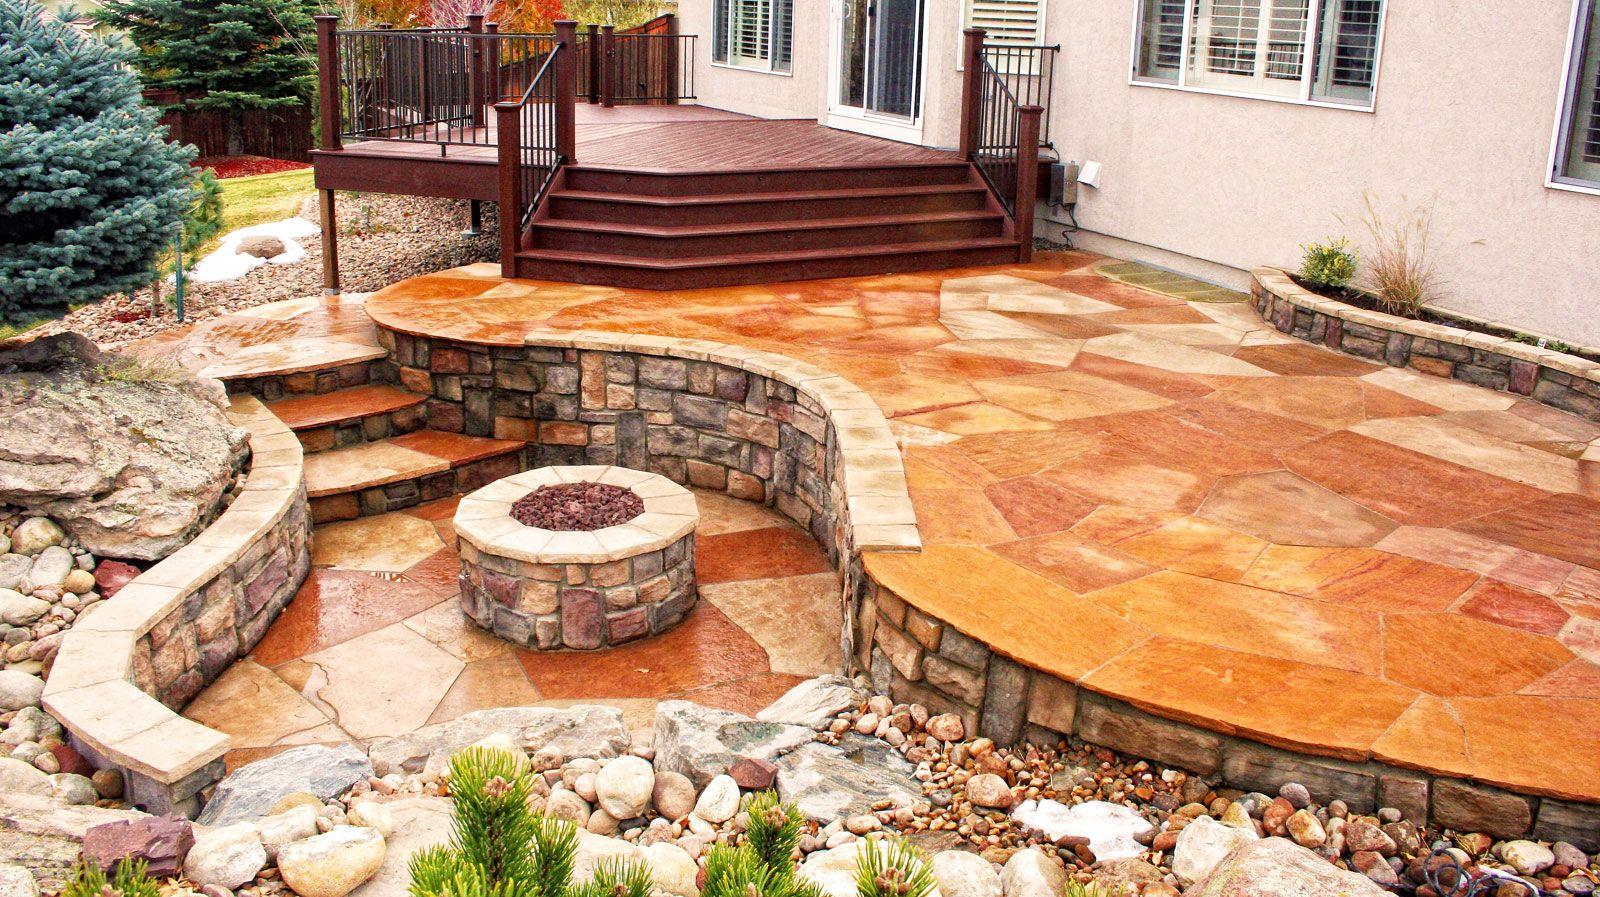 Elite Landscape & Outdoor Living - Denver, Colorado ... on Elite Landscape And Outdoor Living id=29979